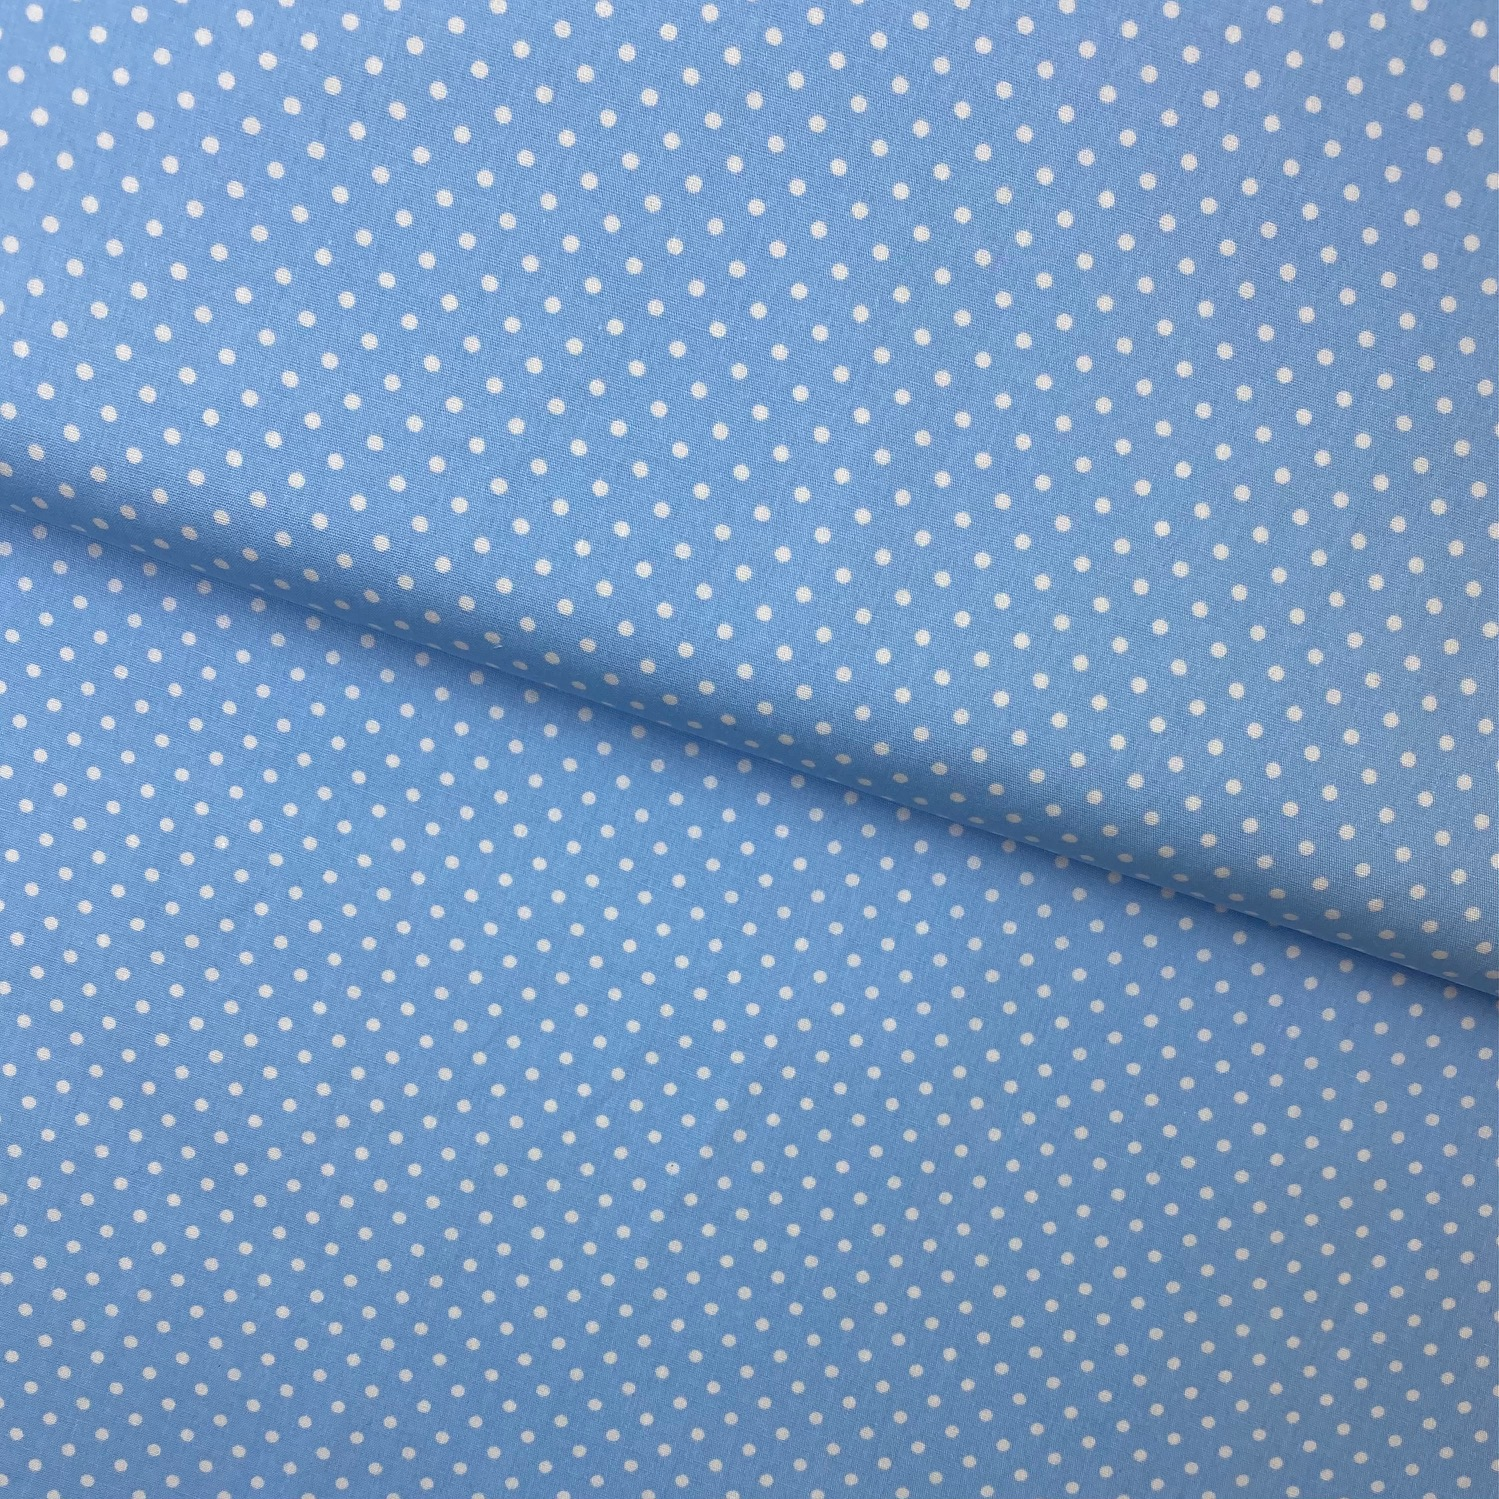 Baumwollpopeline, Punkte, hellblau. Art. SW11367